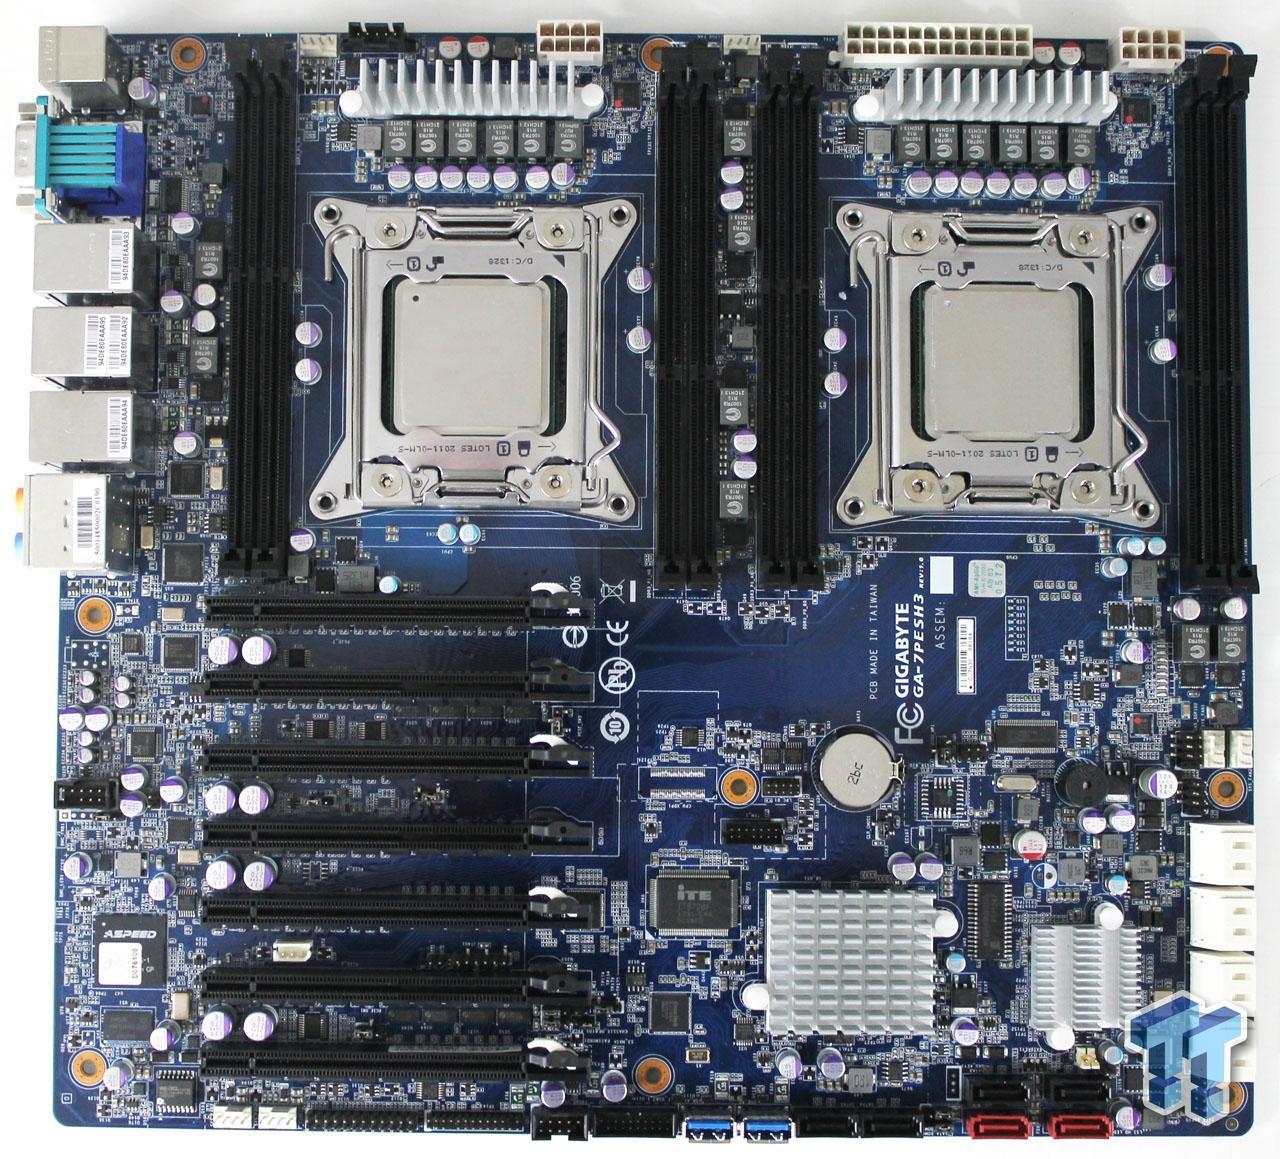 Gigabyte Ga 7pesh3 Intel C602 Workstation Motherboard Review